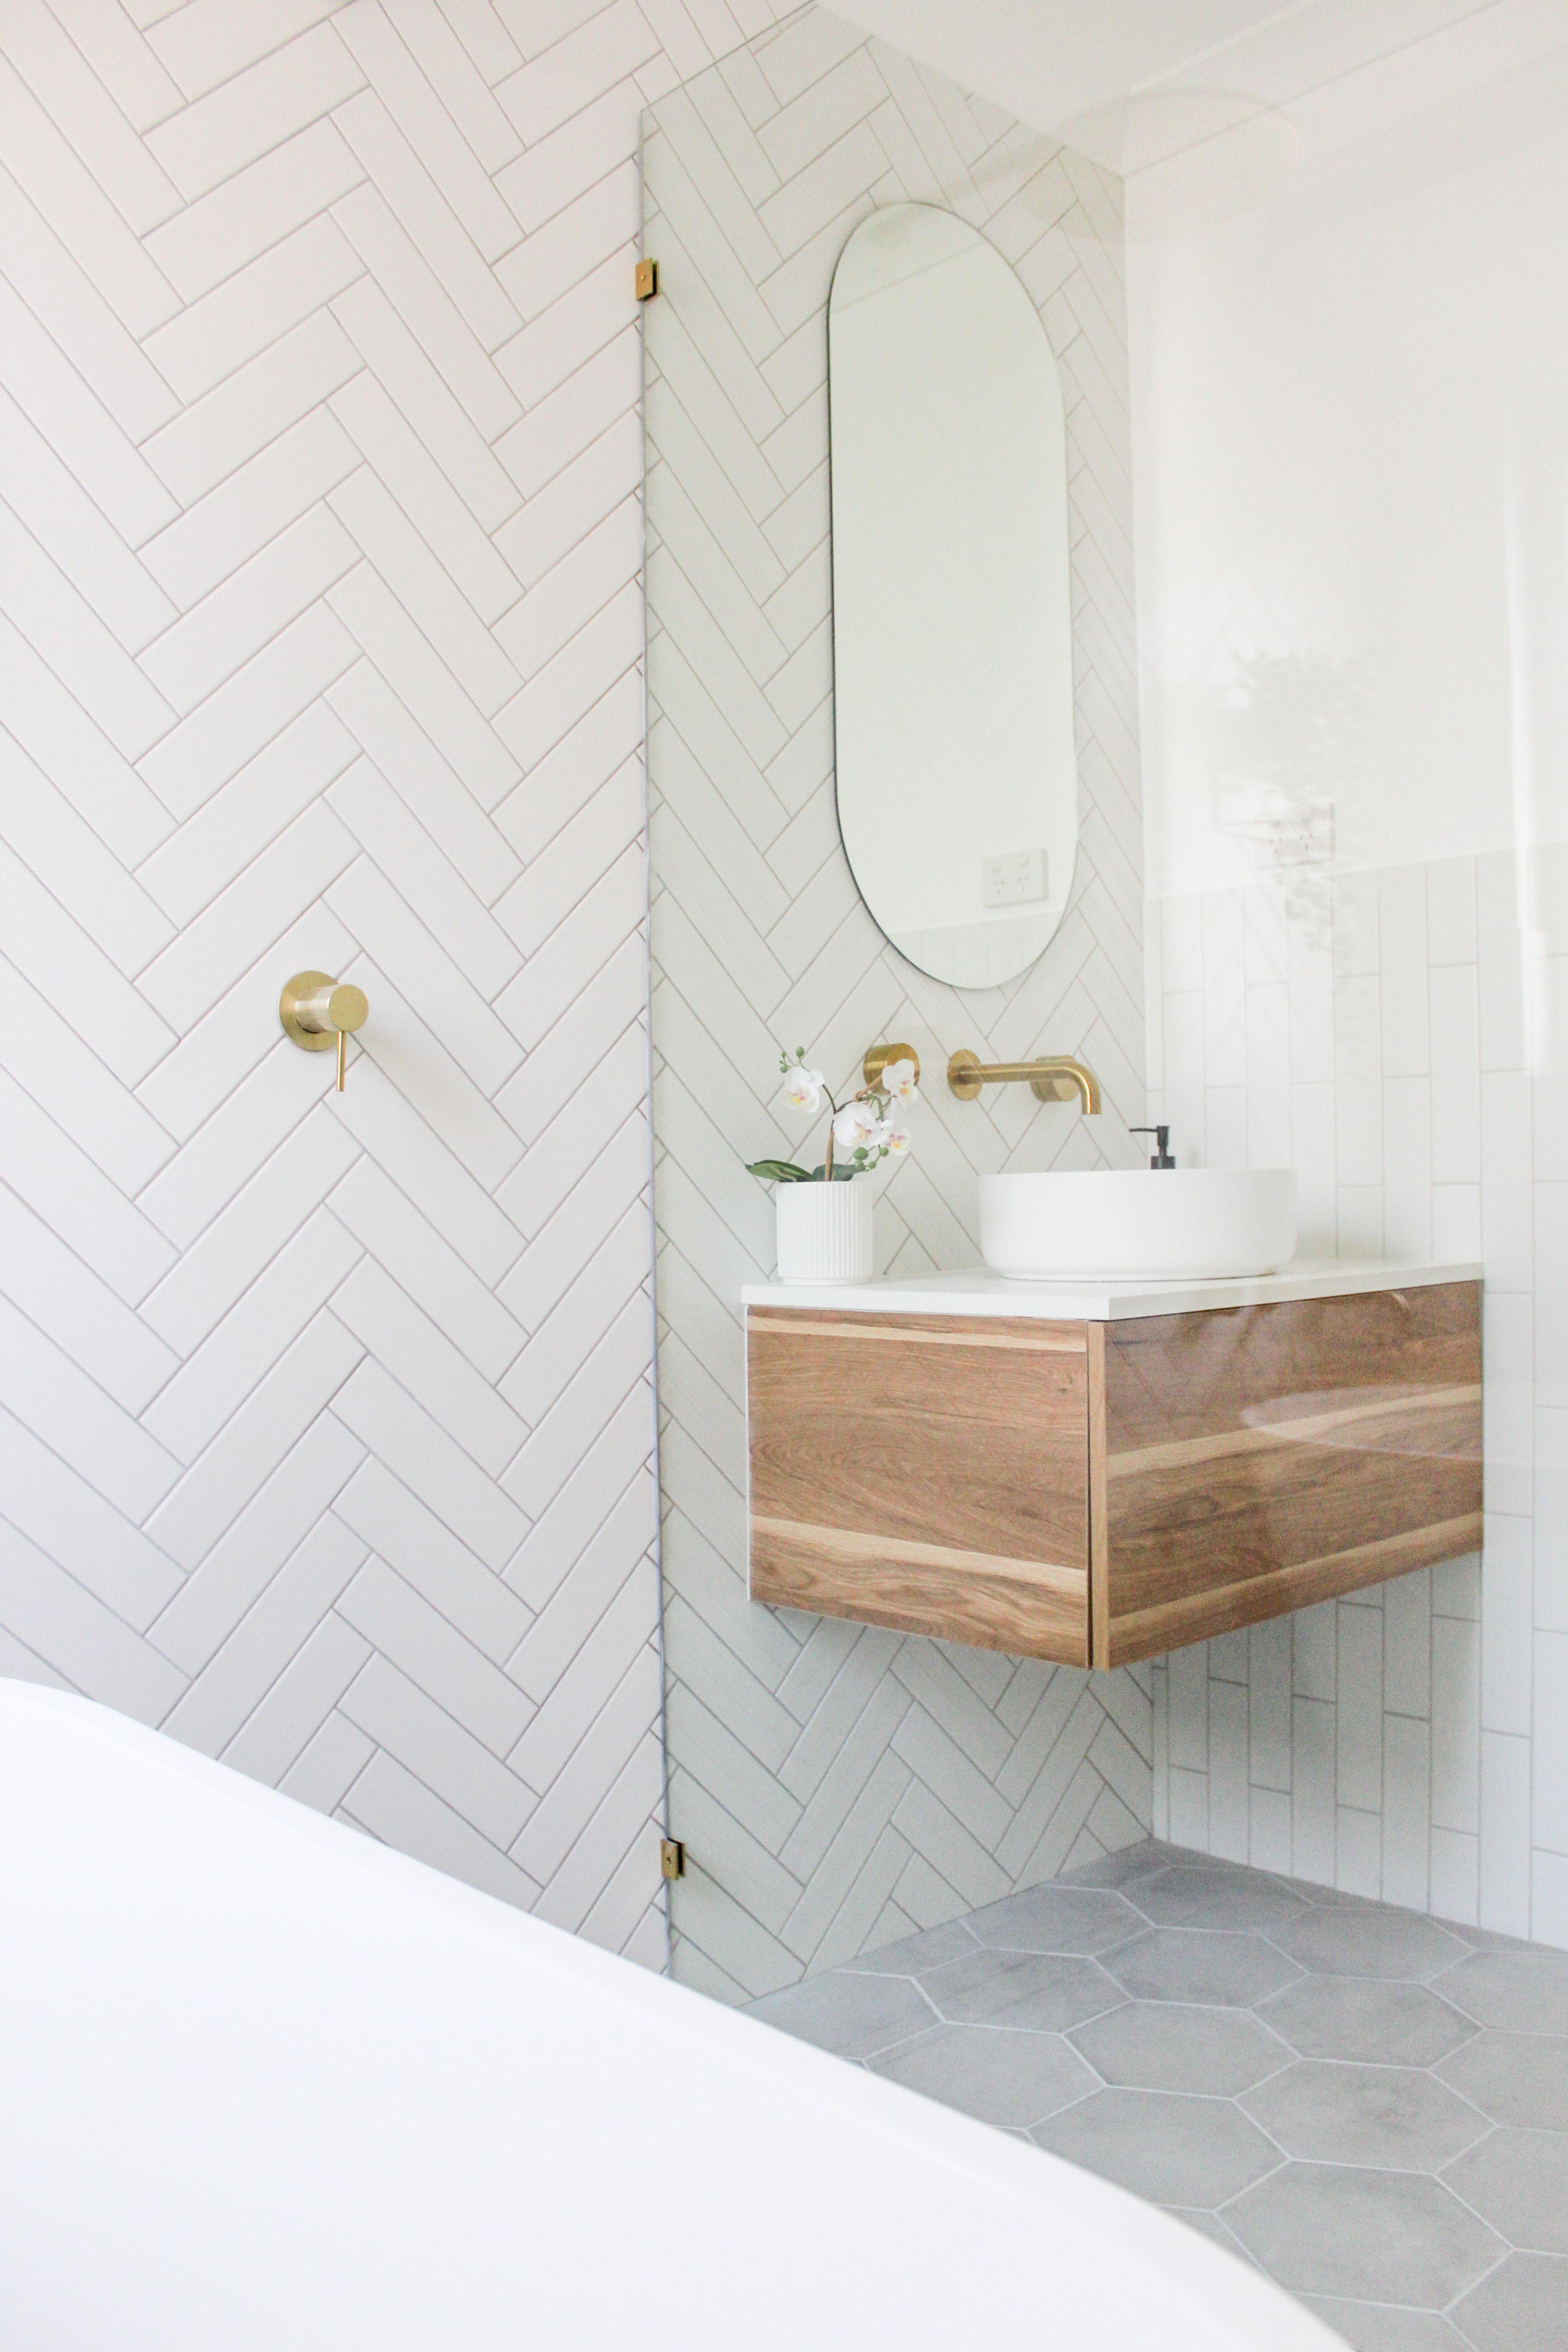 Herringbone Tiling Small Bathroom Renovations Beautiful Bathroom Renovations Bathroom Design Inspiration Newest small bathroom herringbone